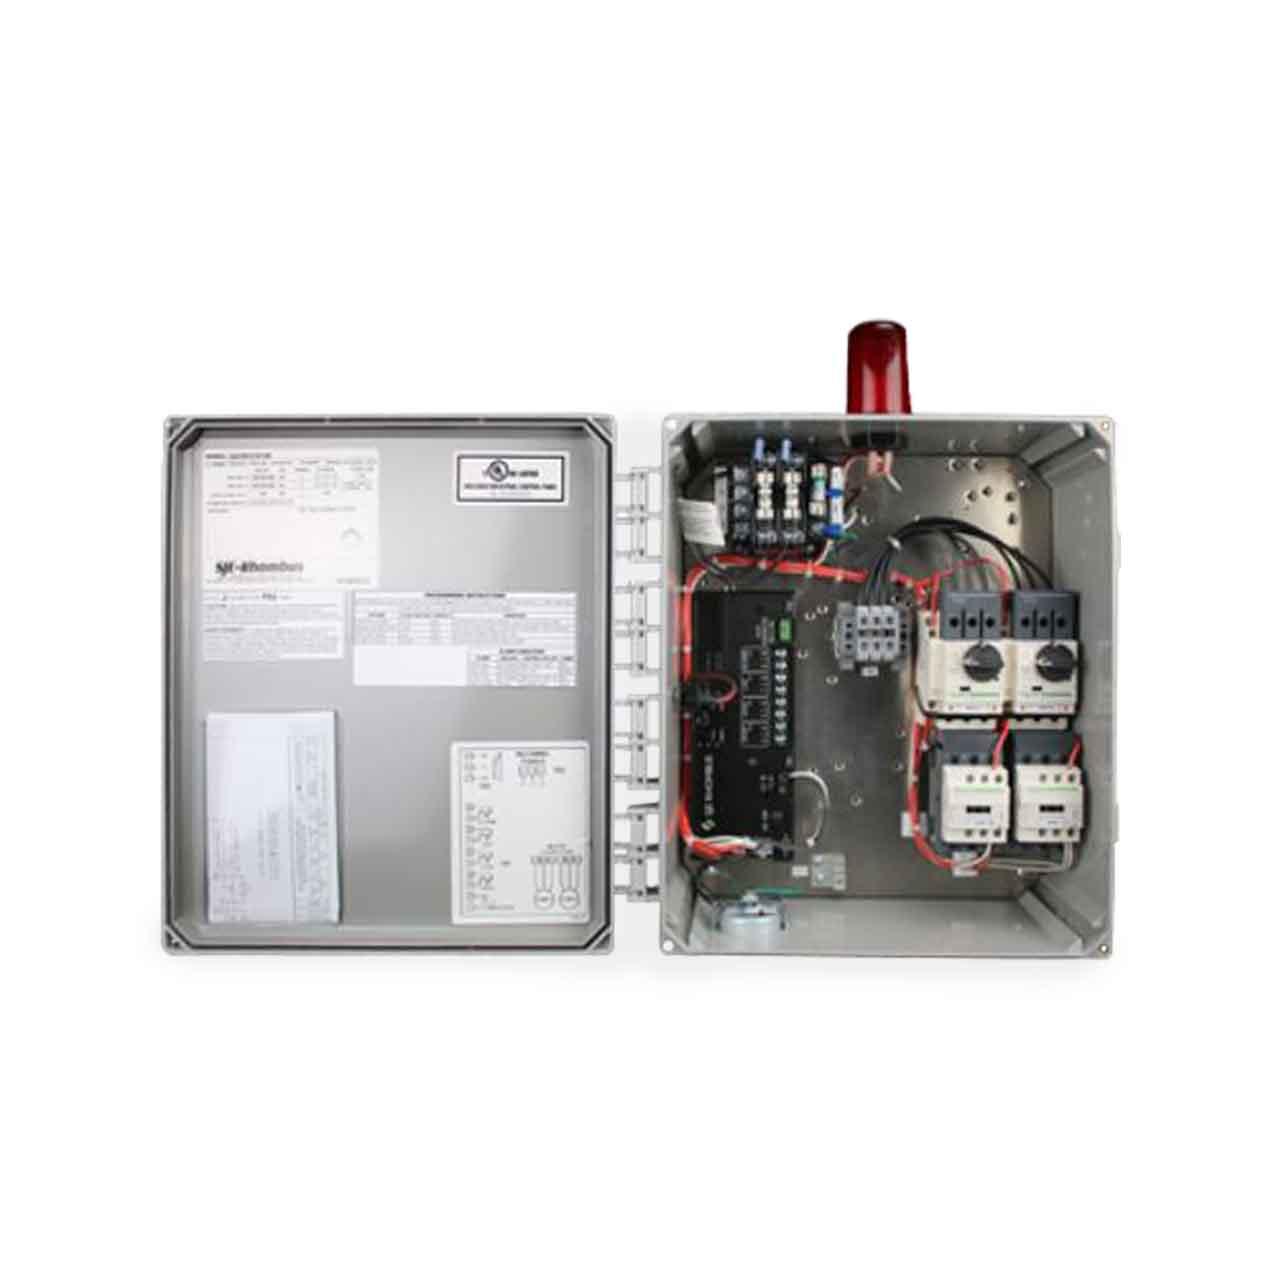 hight resolution of sje rhombus sje rhombus model 322 3 phase 208 240 480 600v duplex sump pump float switch diagram sje float switch wiring diagram